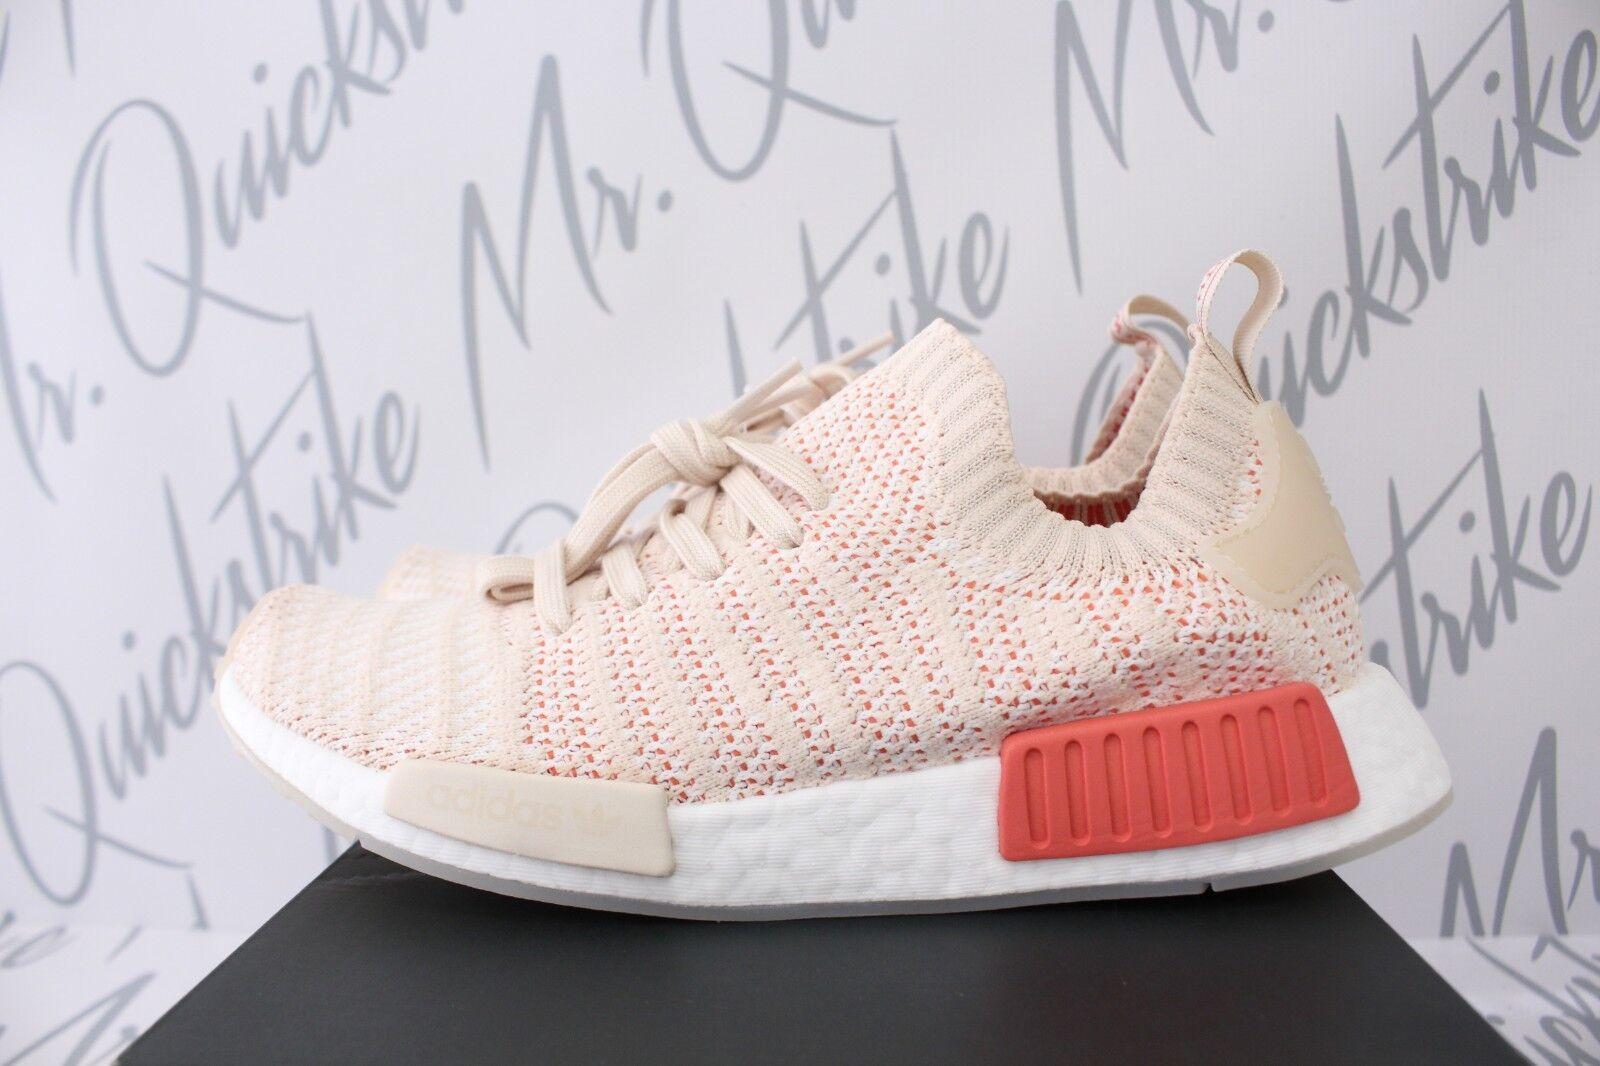 Donne Adidas Originali 10 Nmd R1 Stlt Sz 10 Originali Biancheria Beige Tan Cristallo a13558